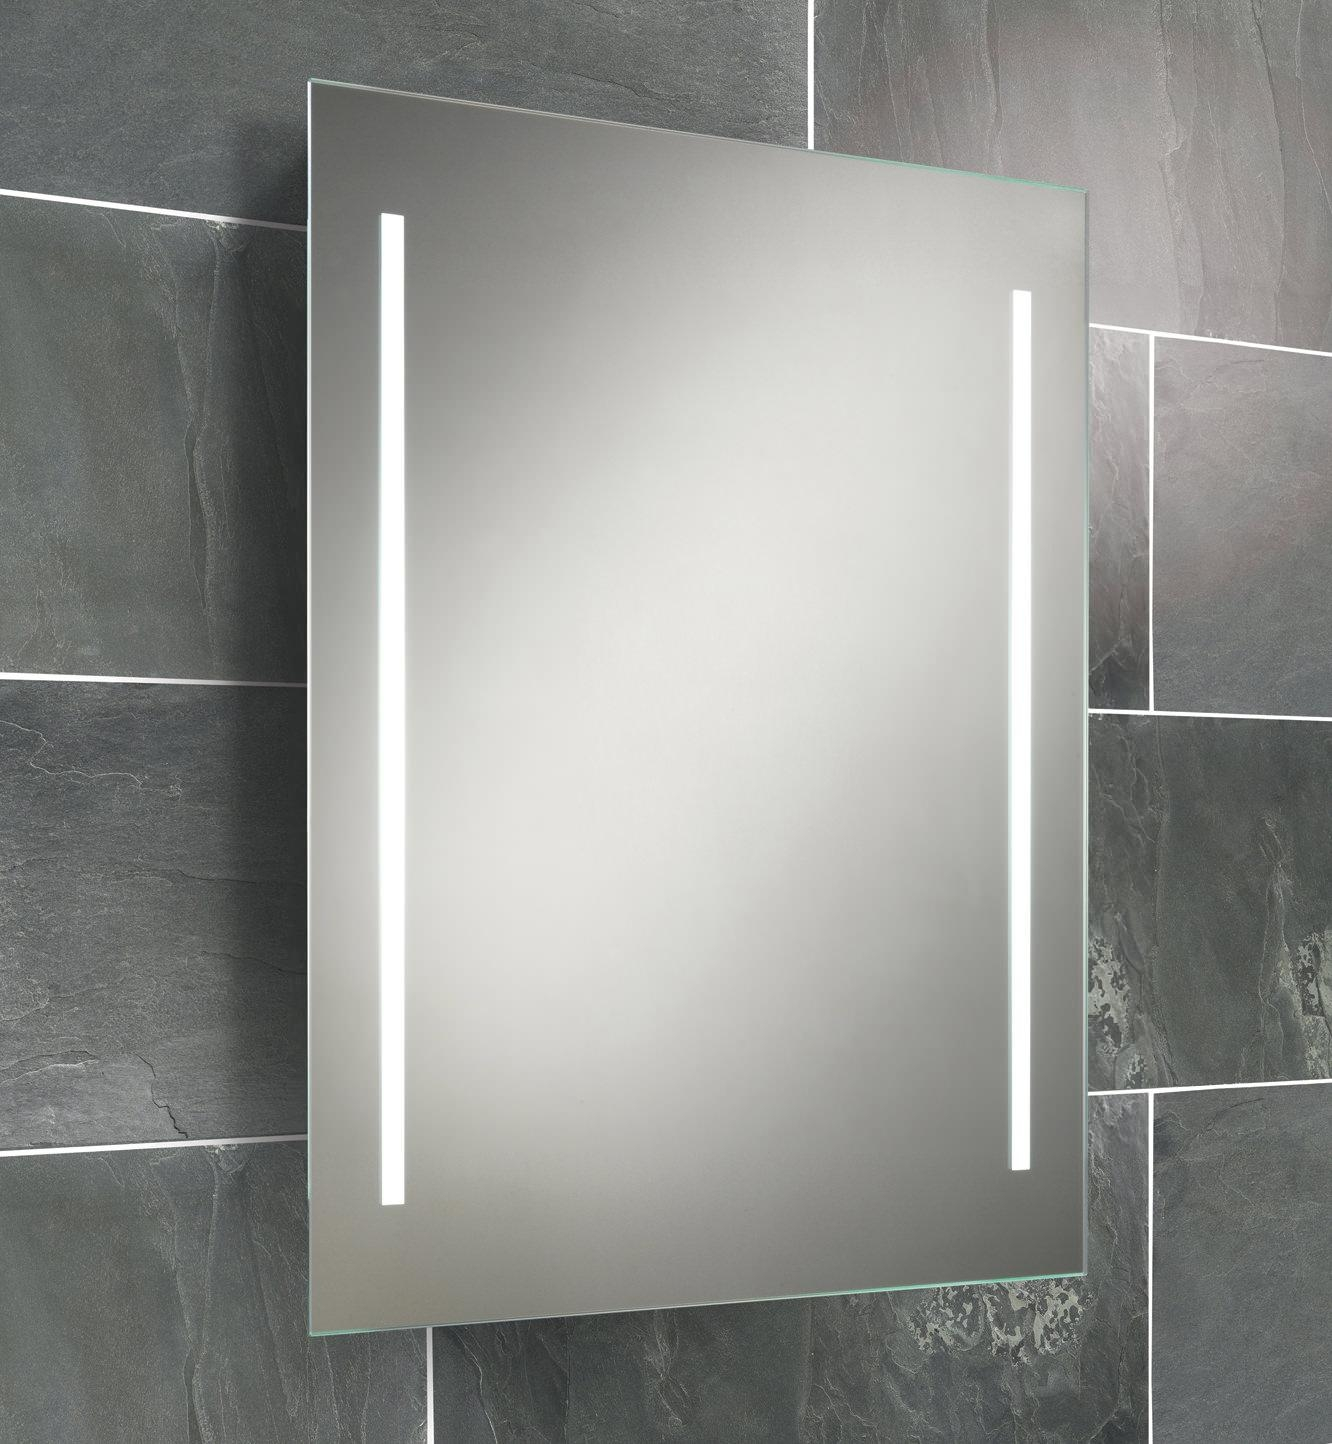 Hib Casey Fluorescent Back Lit Mirror 600 X 800Mm | 77309000 Regarding Large Illuminated Mirror (Image 12 of 20)